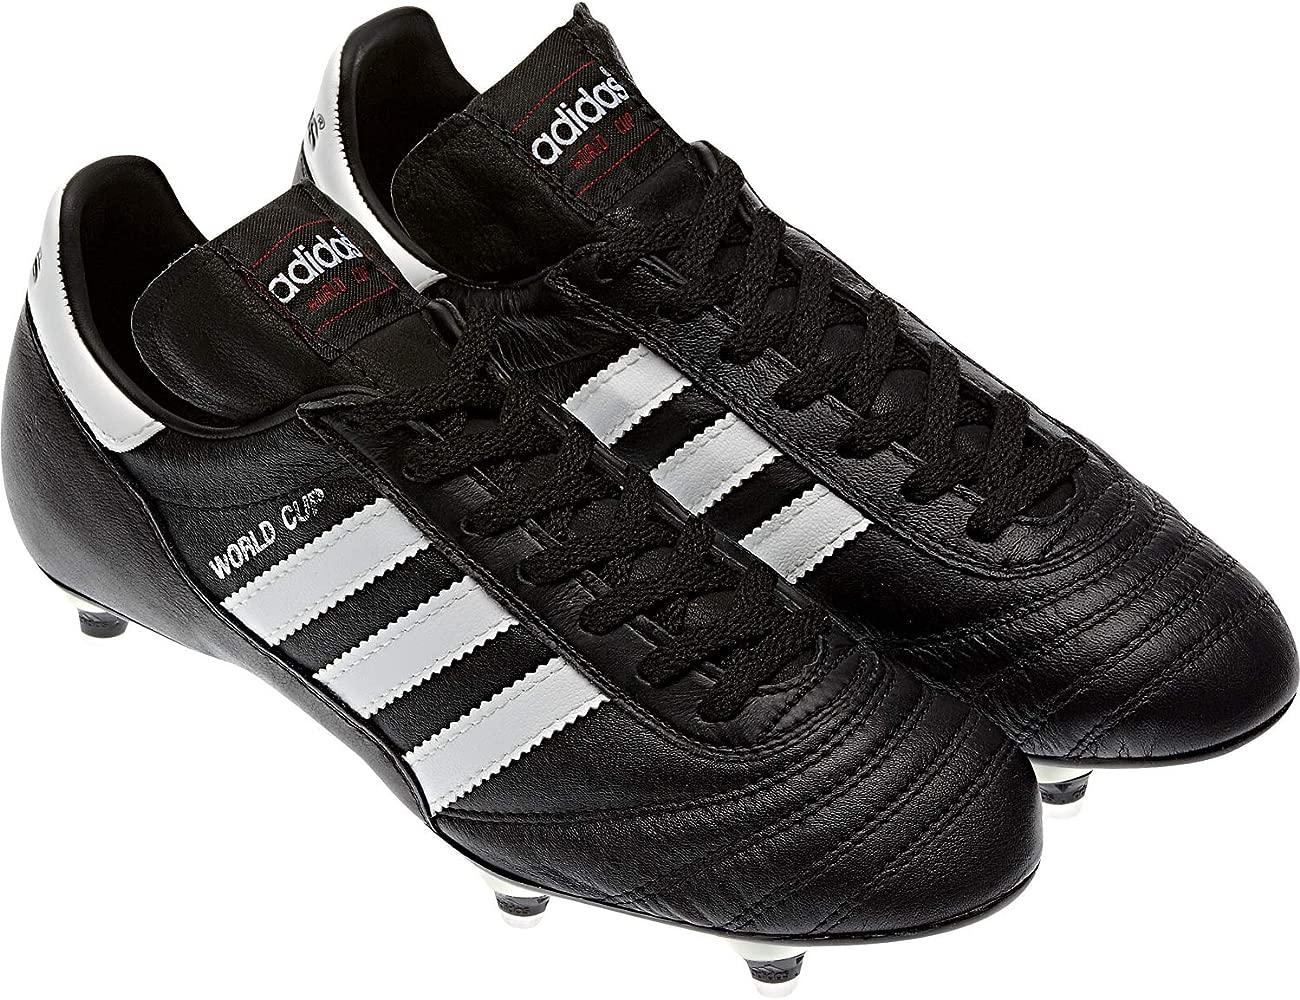 Men's World Cup Football Boots